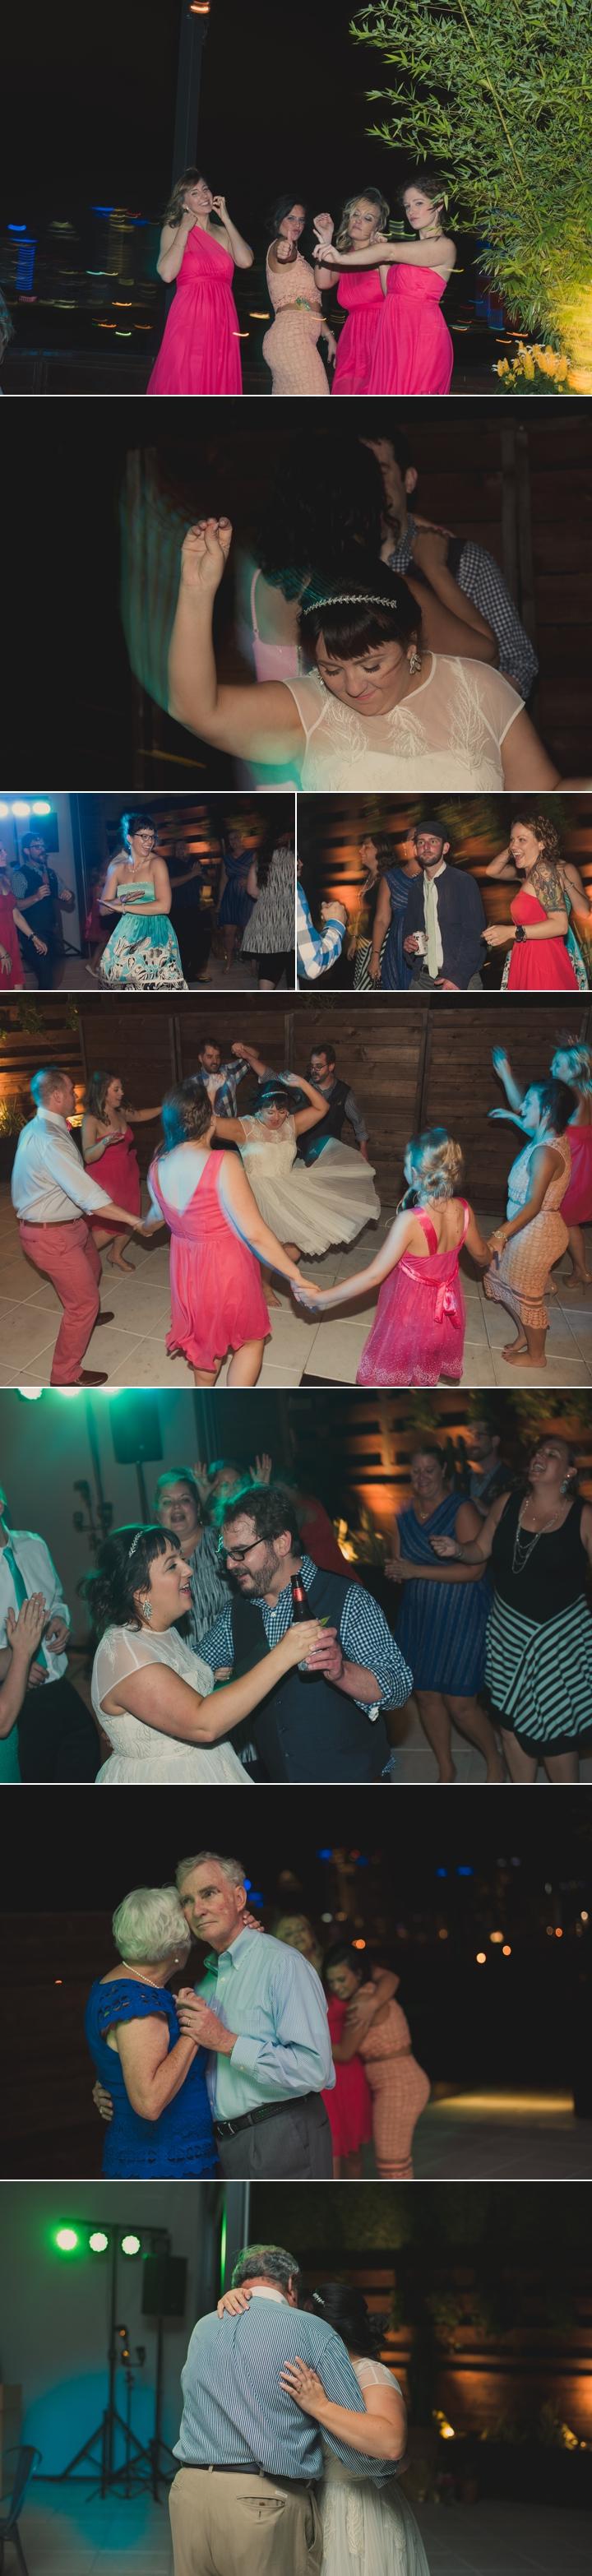 dallas-wedding-photographer-hw 40.jpg